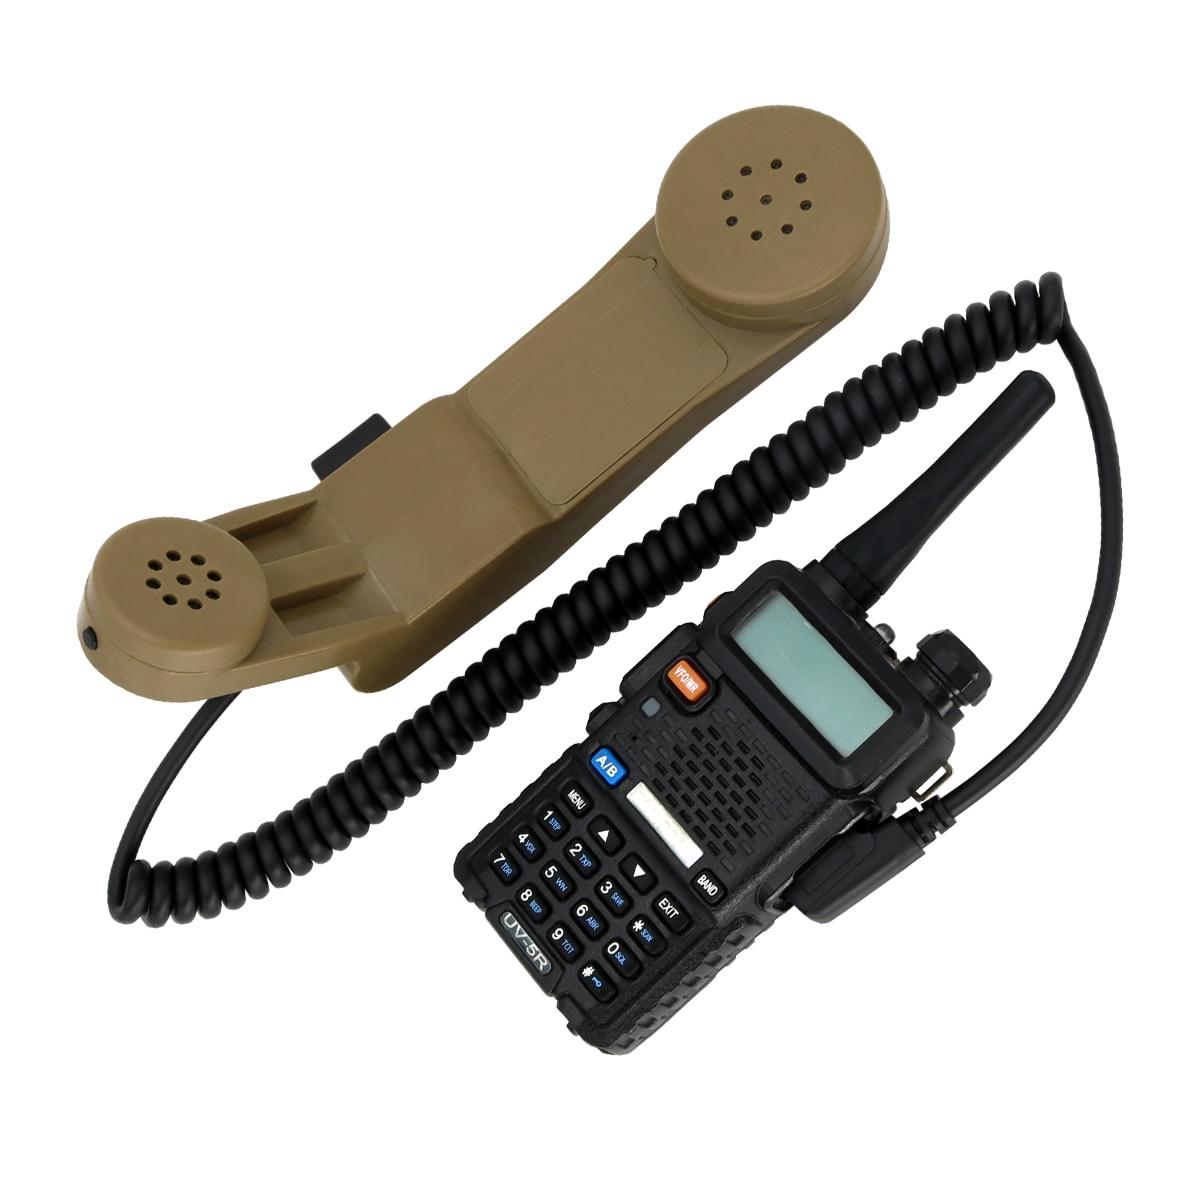 Купить с кэшбэком H250 Tactical Headphones Interphone Adapter Military Handheld Speaker Microphone PTT Kenwood Intercom Microphone  DE